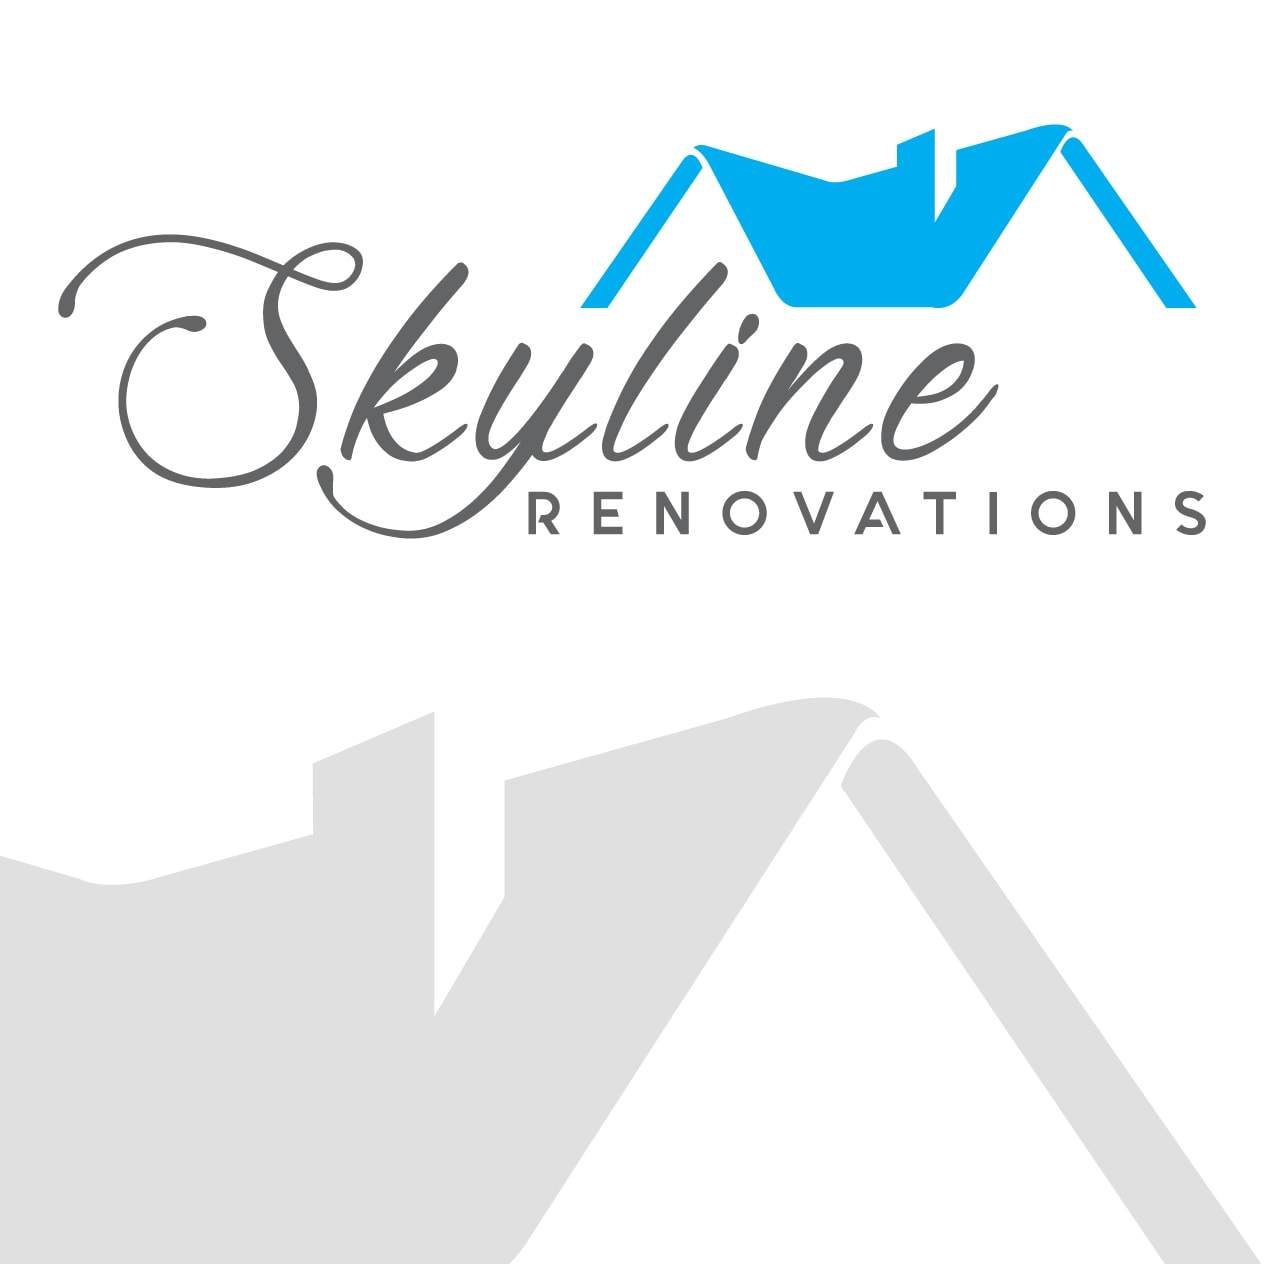 Skyline Renovations